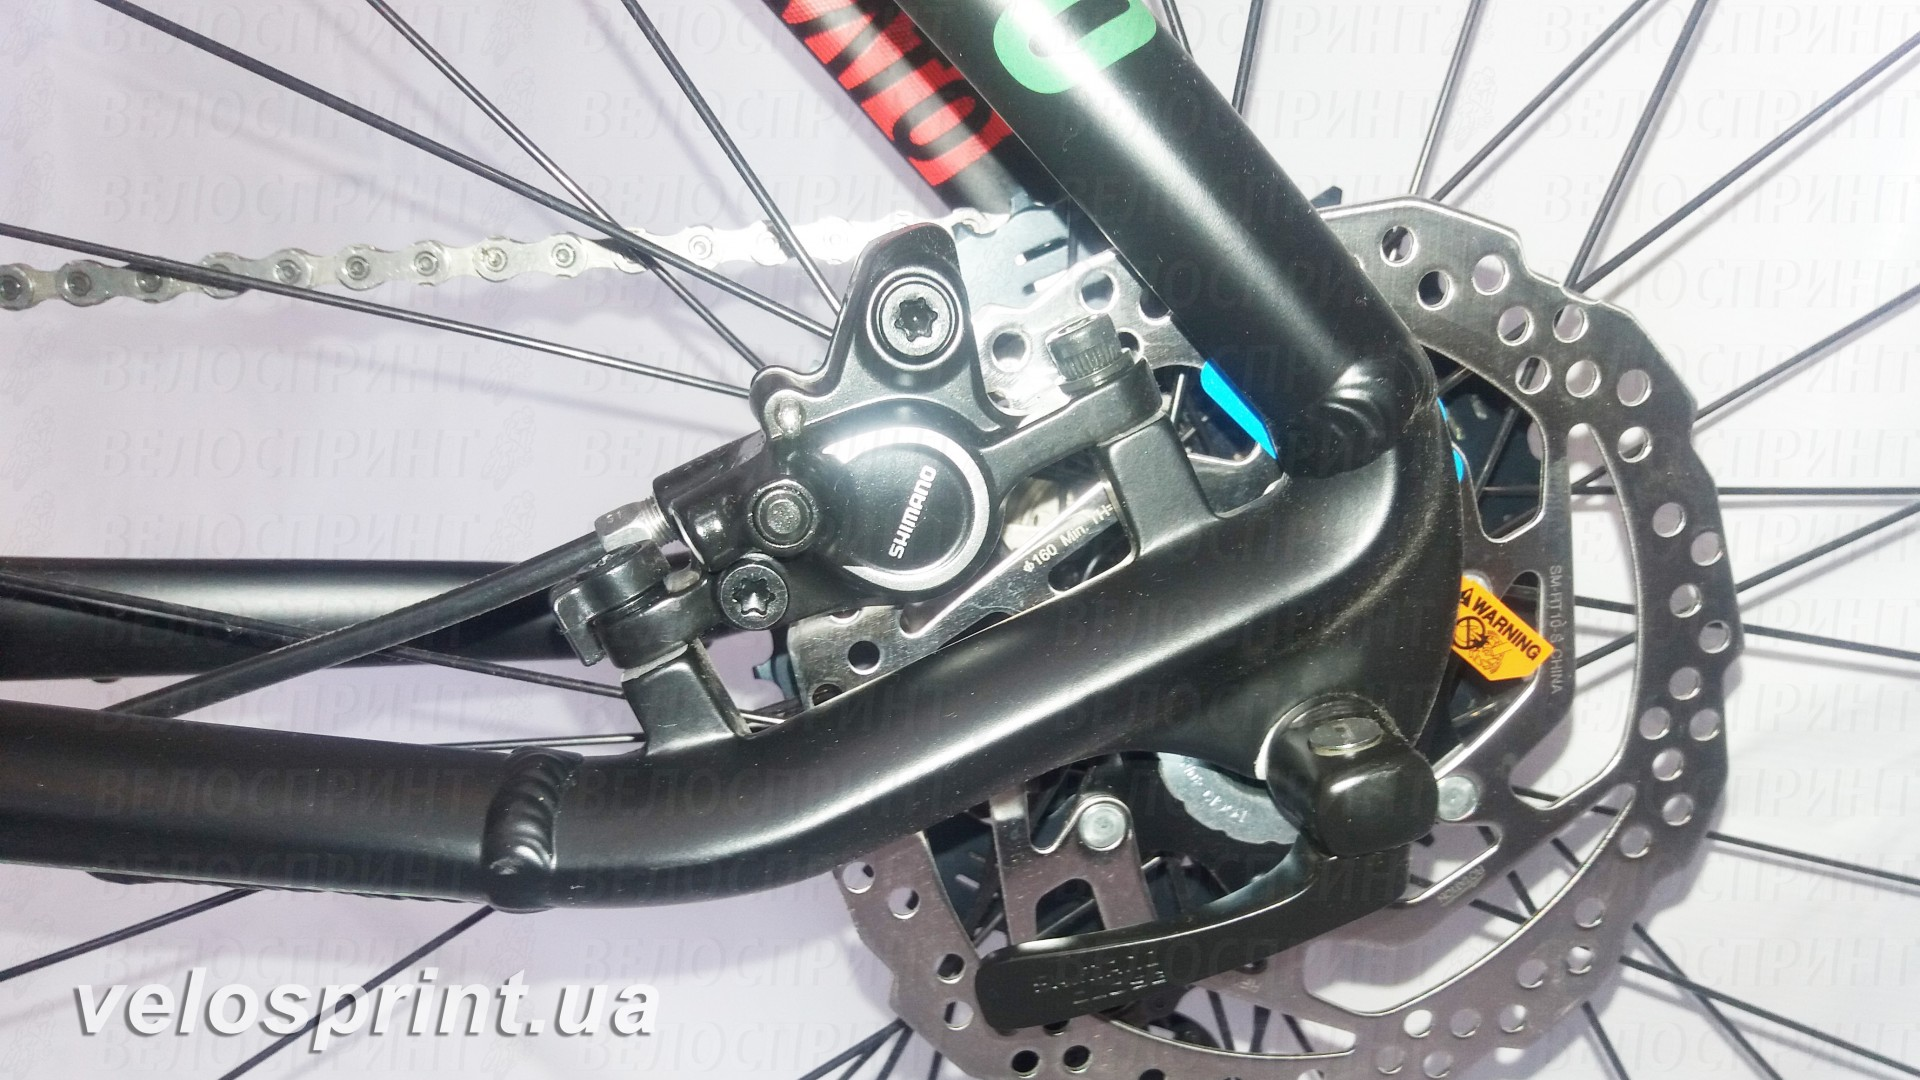 Велосипед GHOST Kato 7 AL 29 nightblack/riotgreen/neonred эксцентрик год 2017